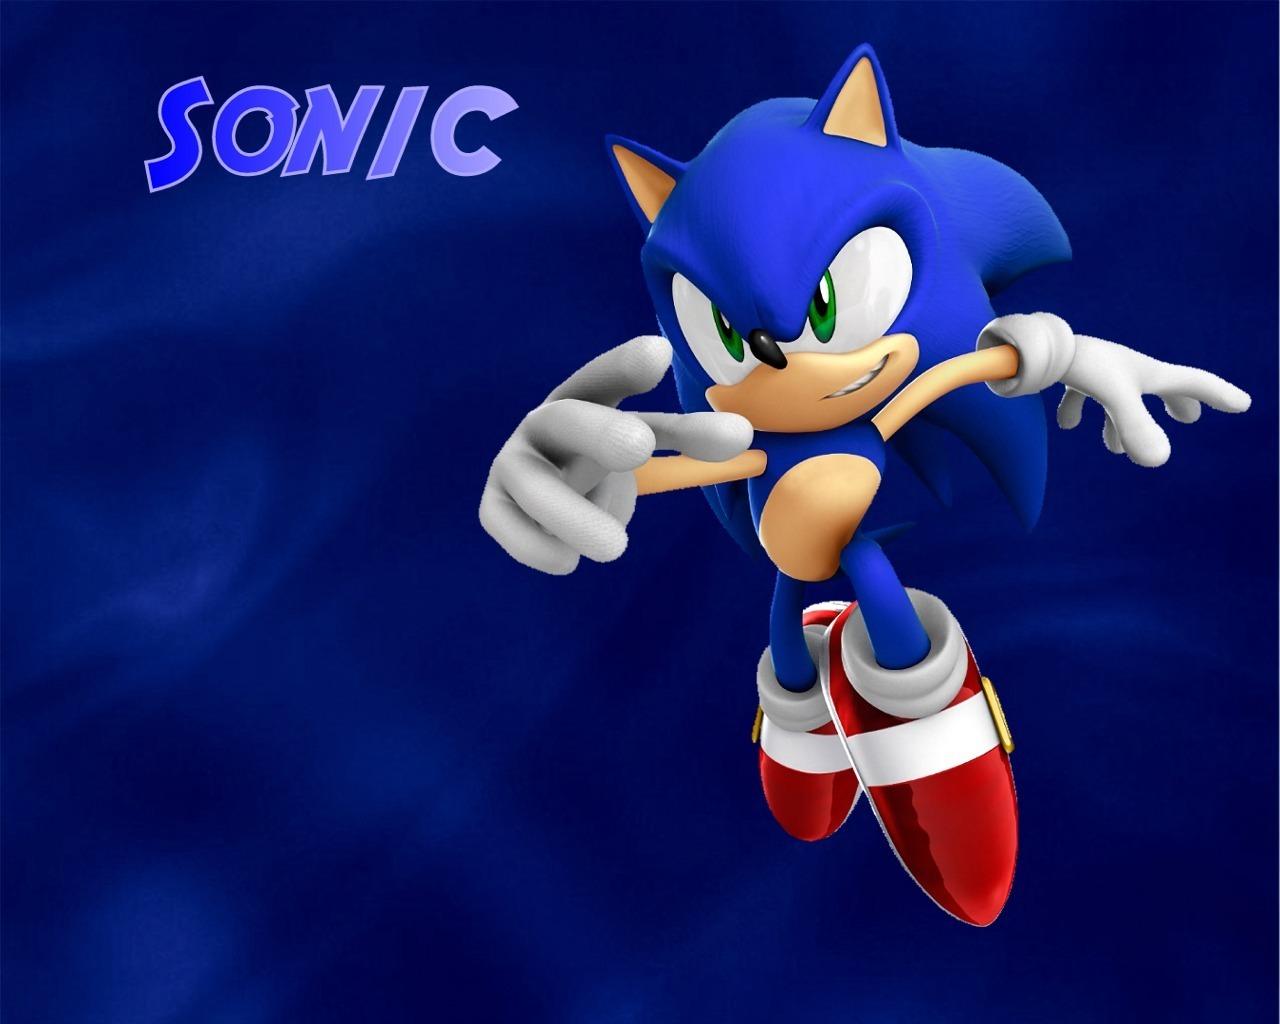 Glamorous Sonic The Hedgehog Sega Wallpaper Download 1280x1024px